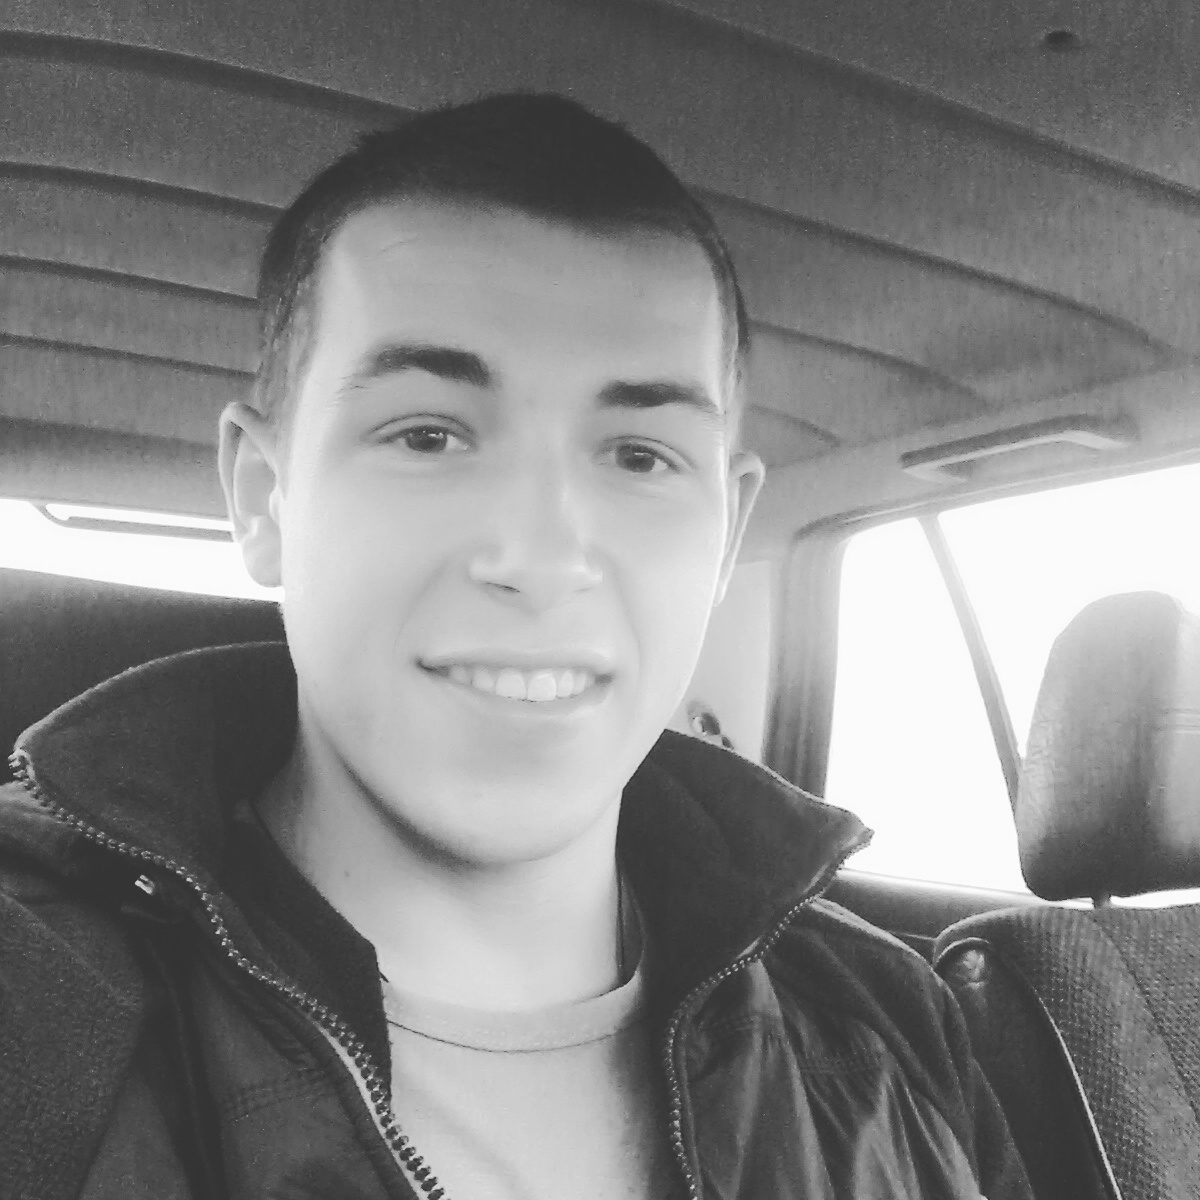 Дмитрий Удод. Фото: соцсети